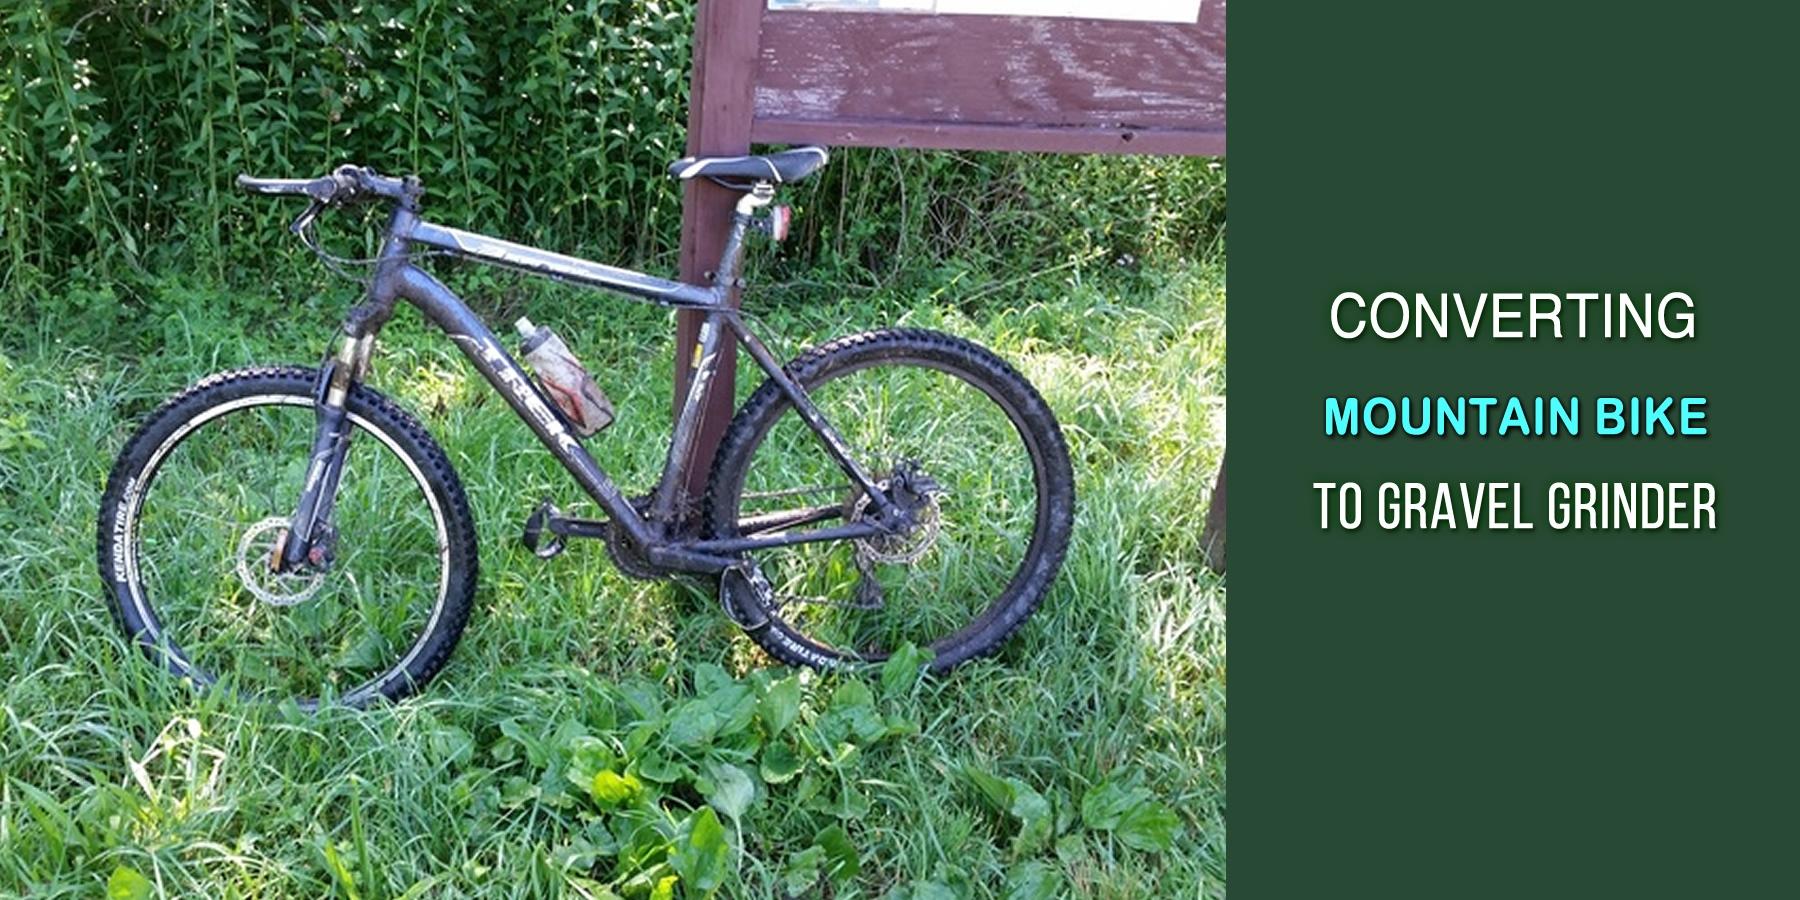 Converting Mountain Bike To Gravel Grinder